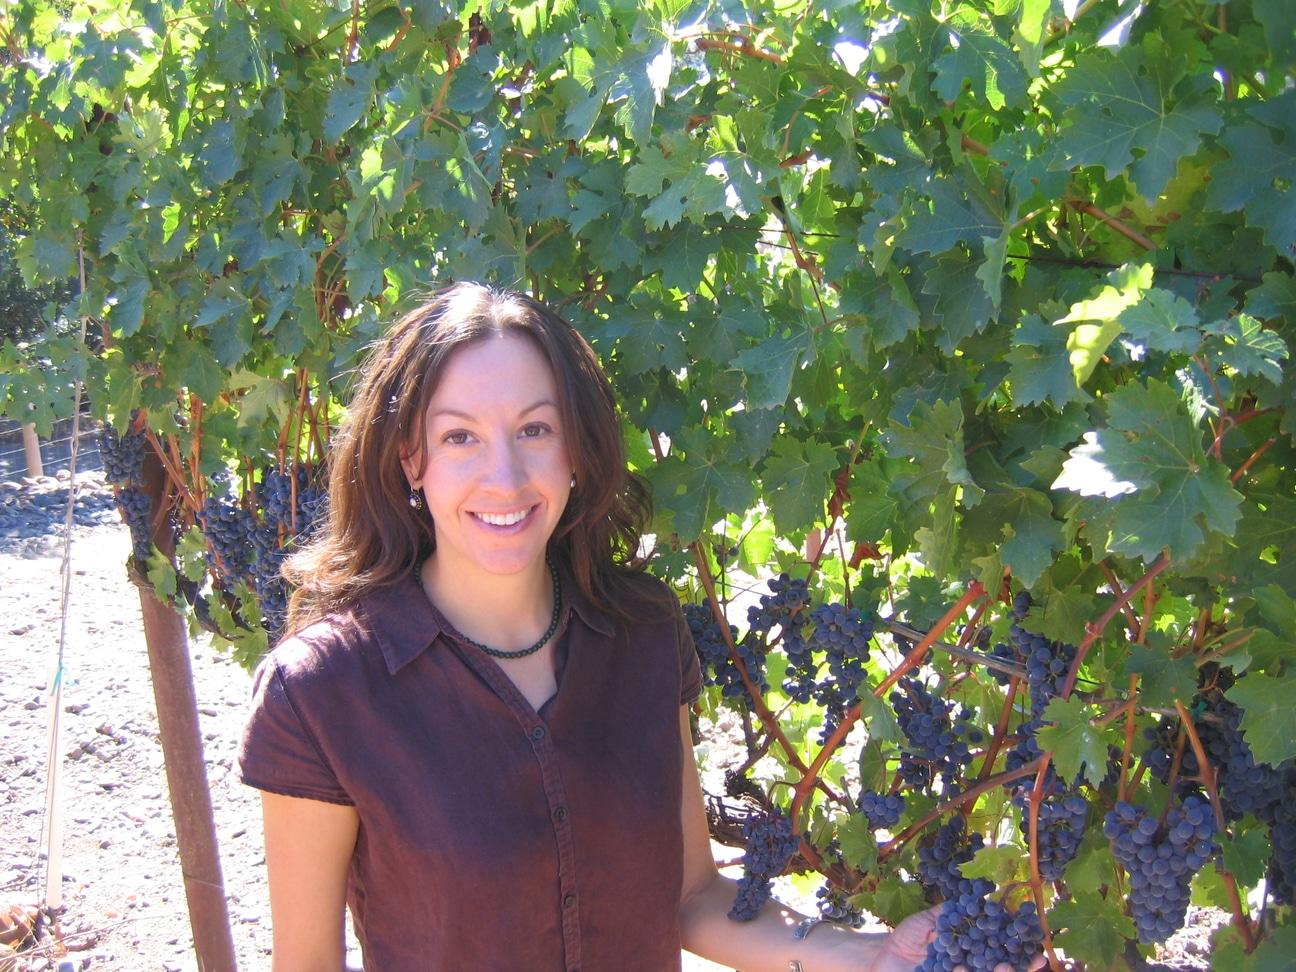 wednesdays with winemakers